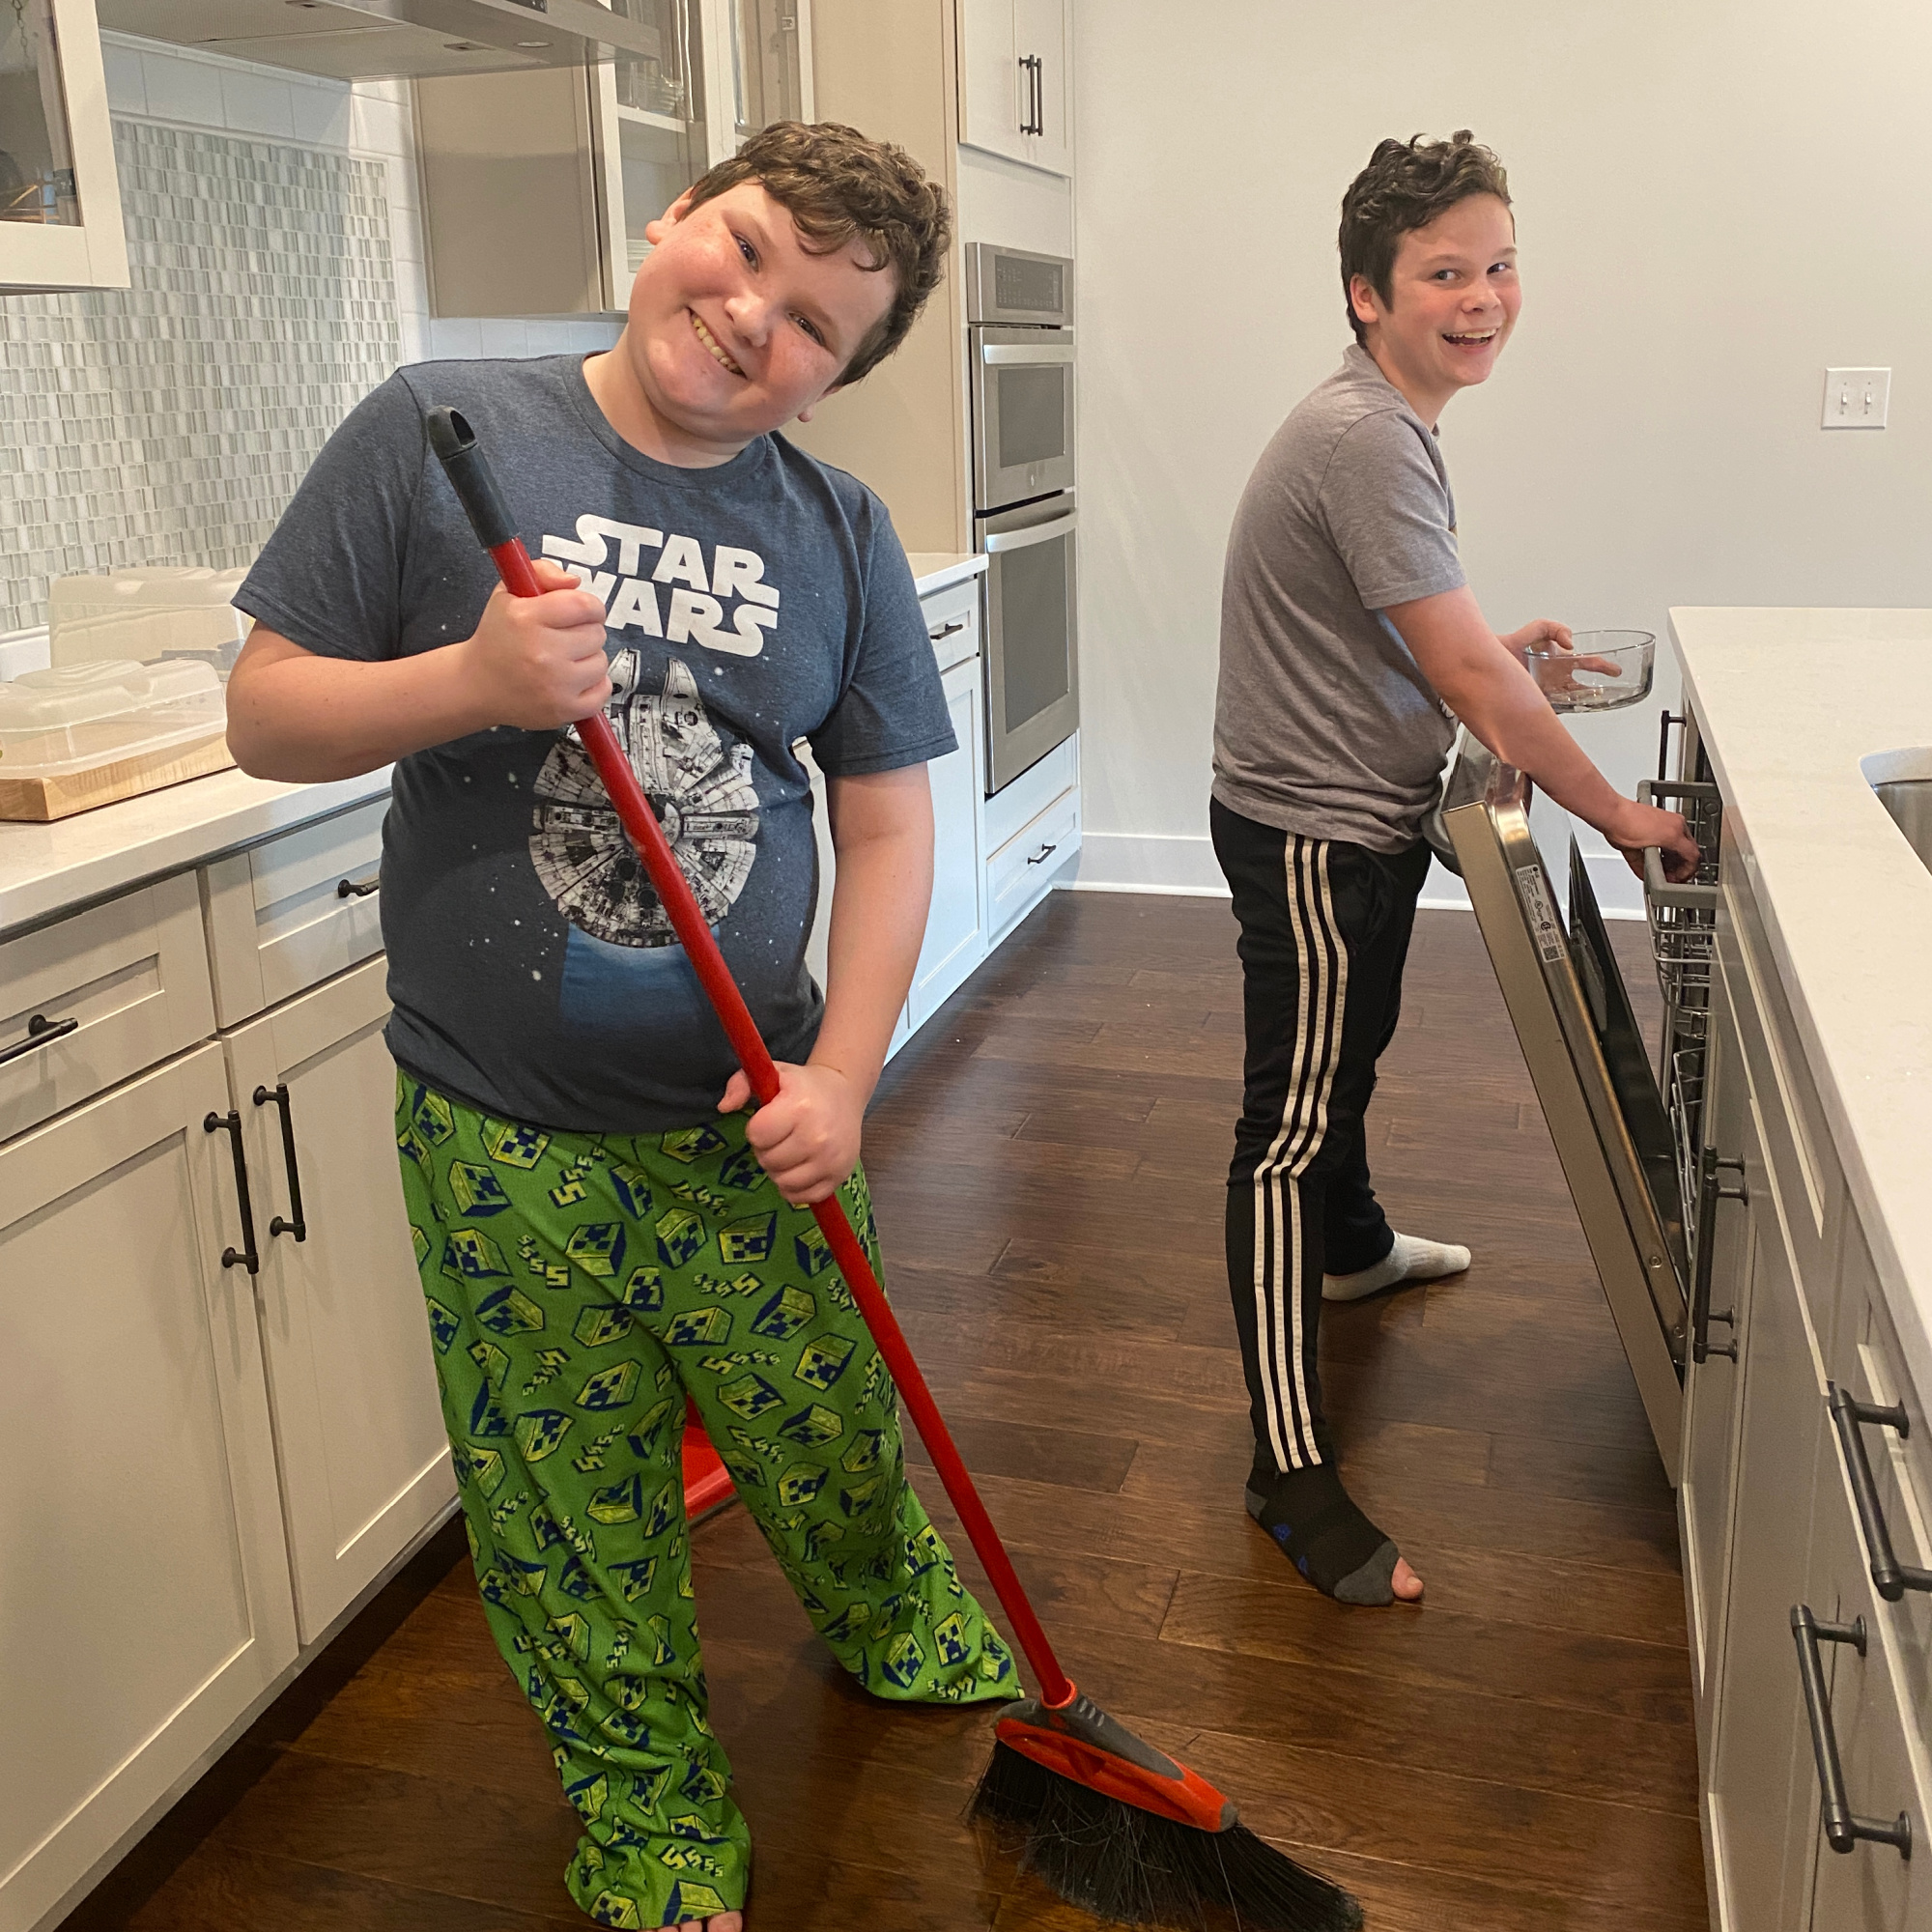 teens doing work chores